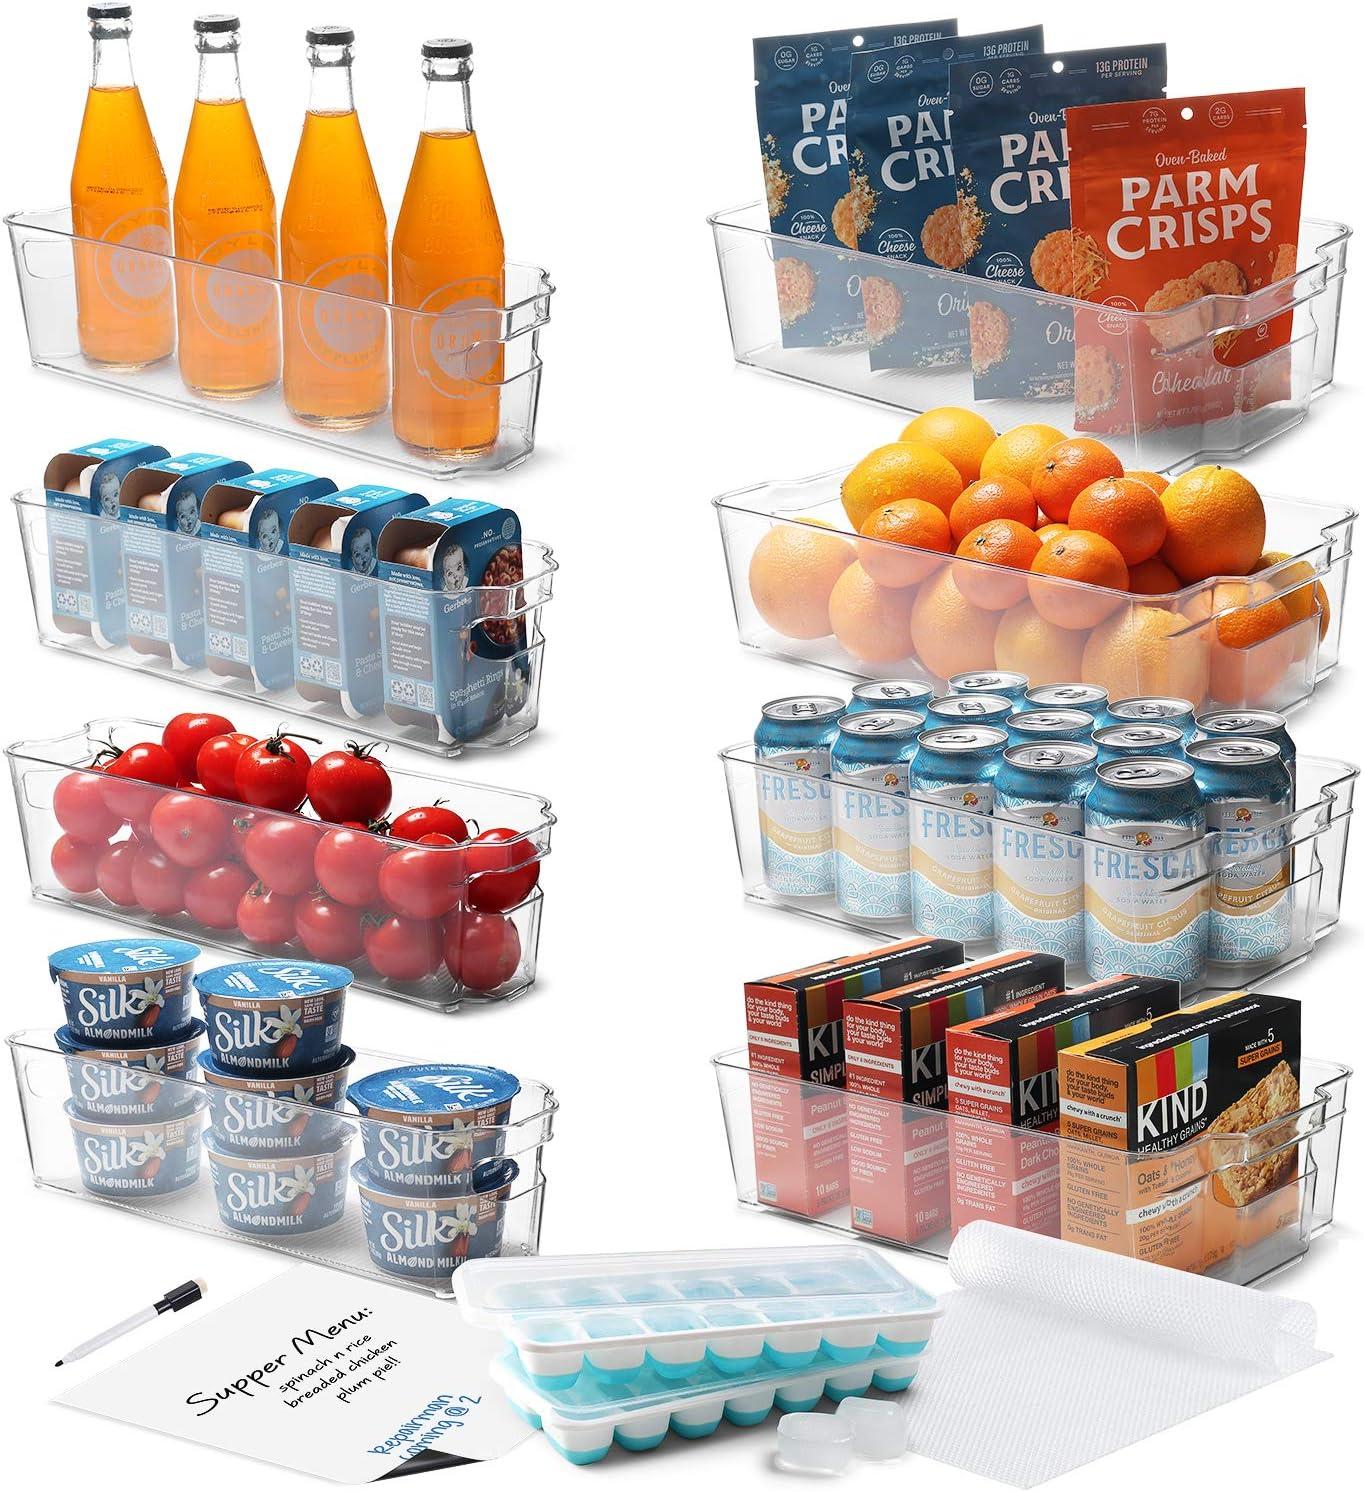 StorageBud Fridge Organizer - Bins Refrigerator PC Denver wholesale Mall 16